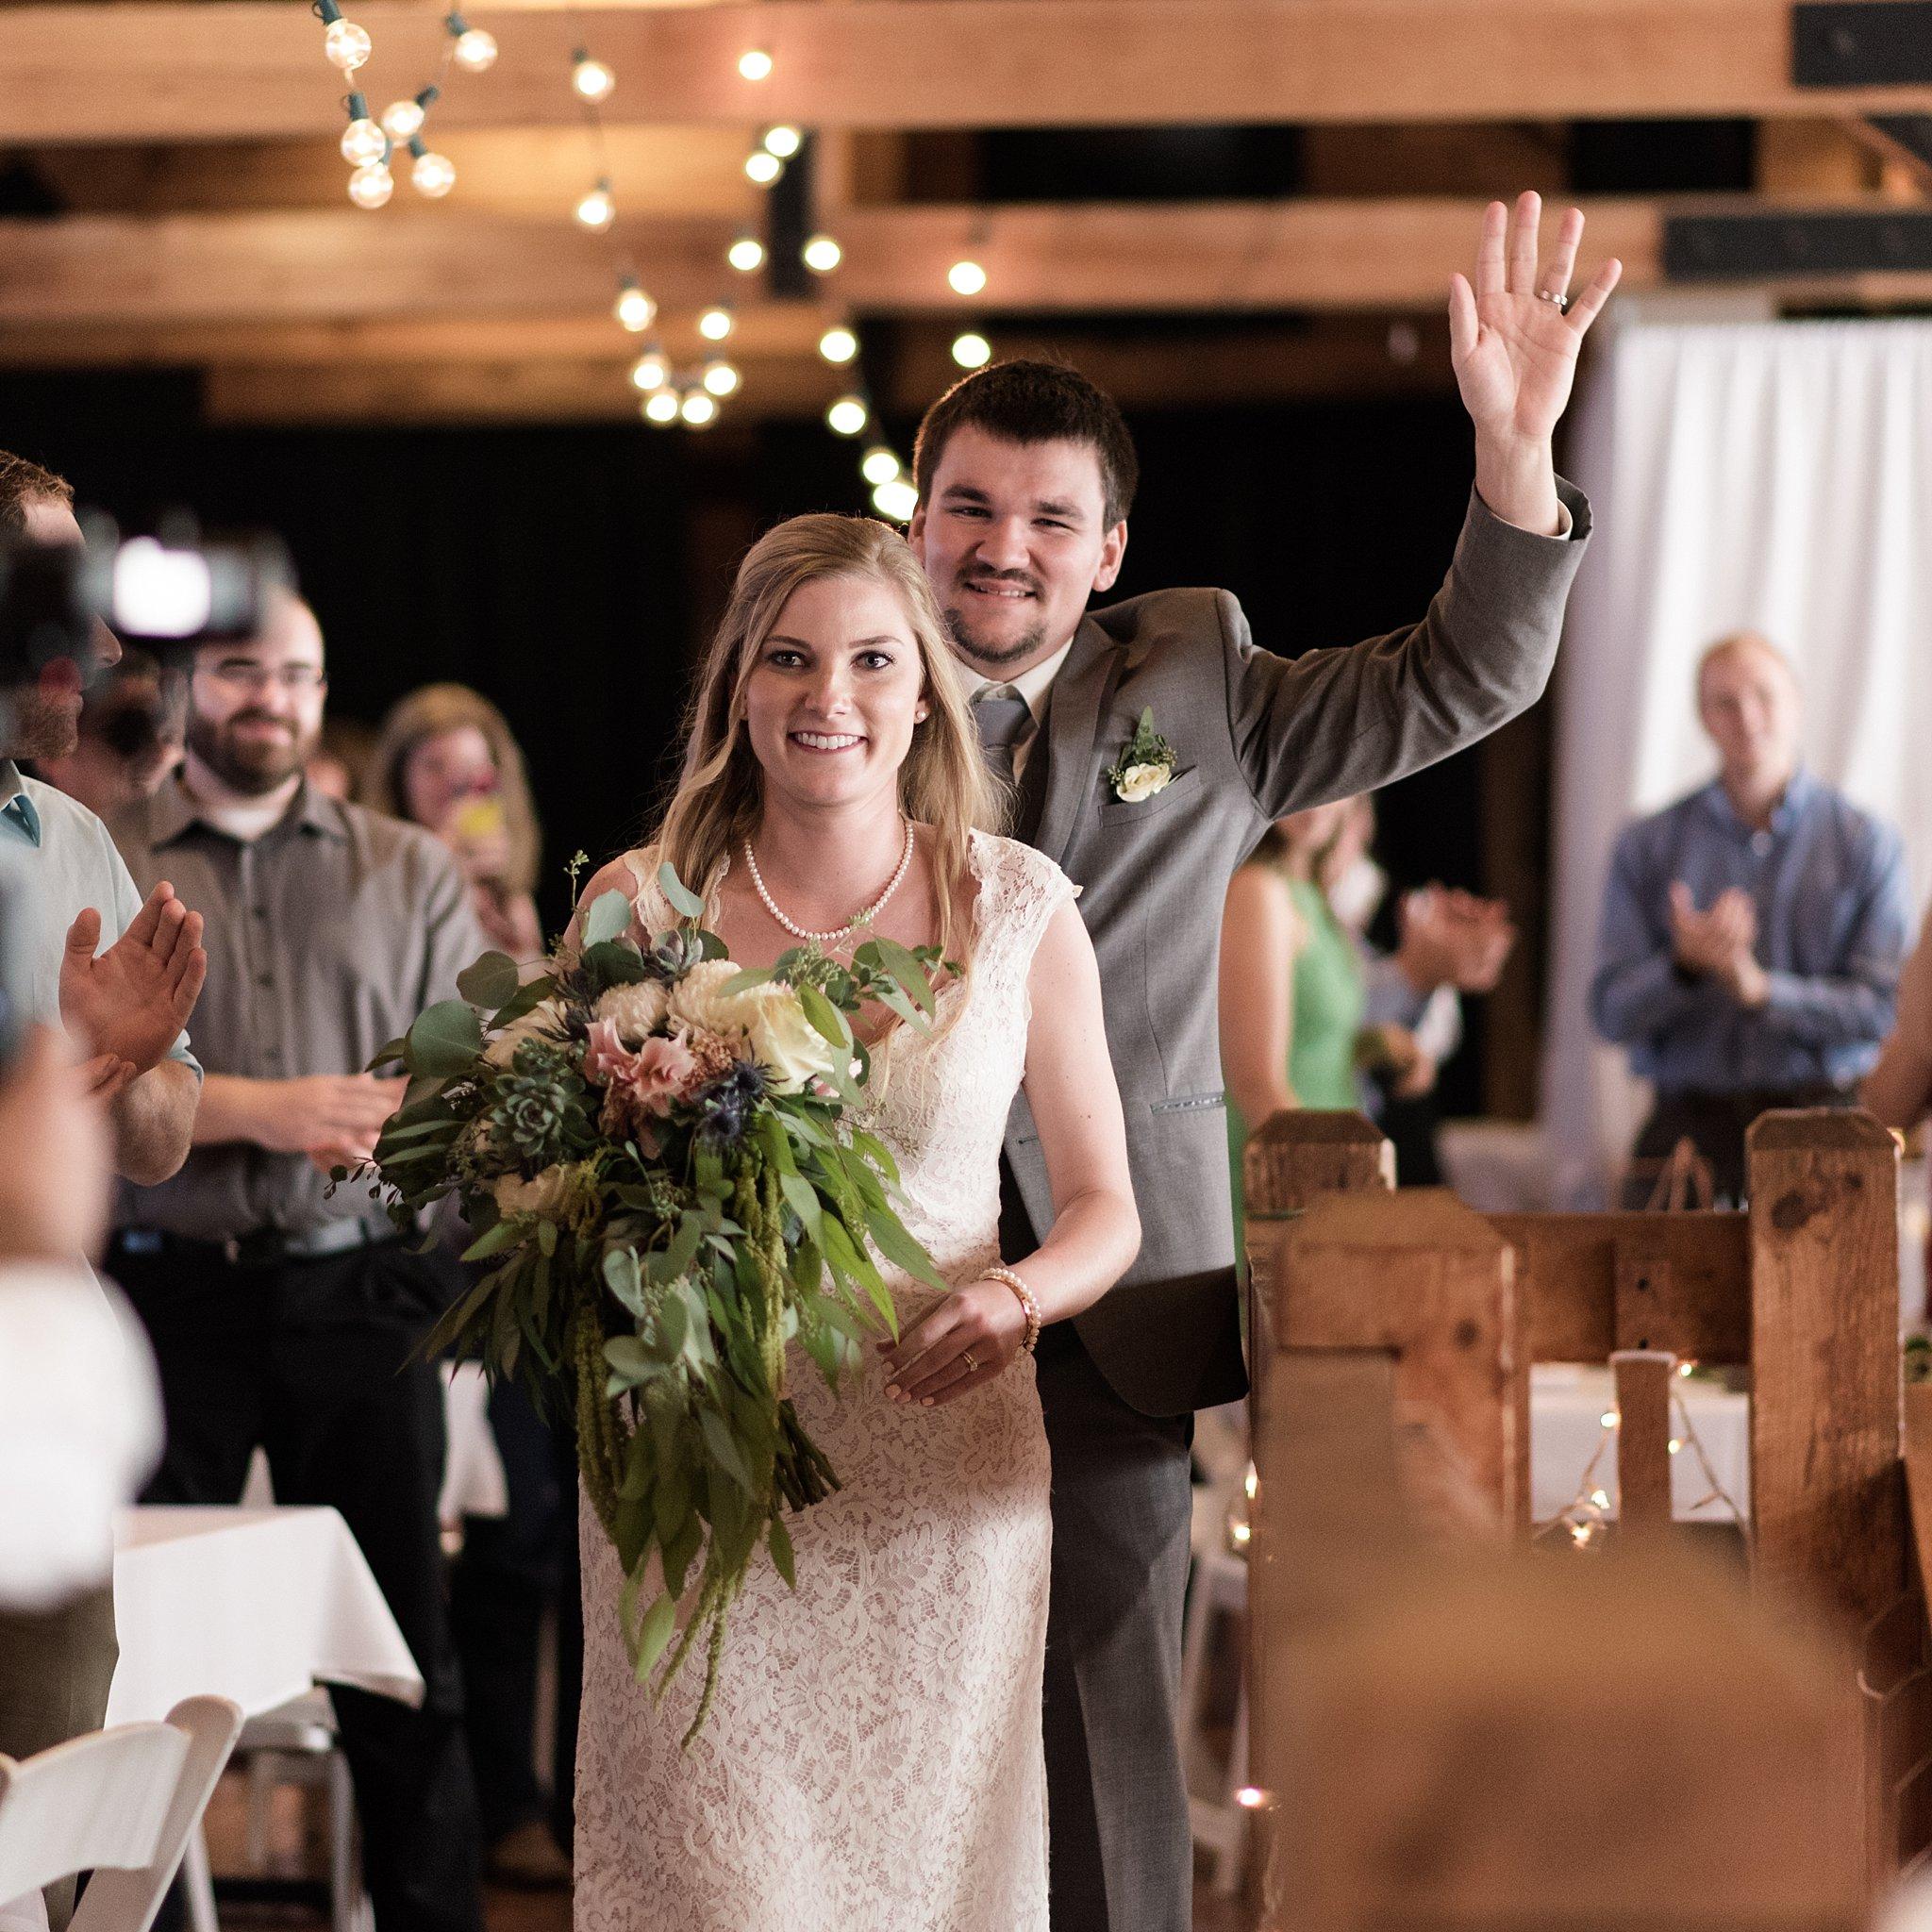 Cadillac-Michigan-wedding-caberfae-peaks-milwaukee-photographer_0076.jpg